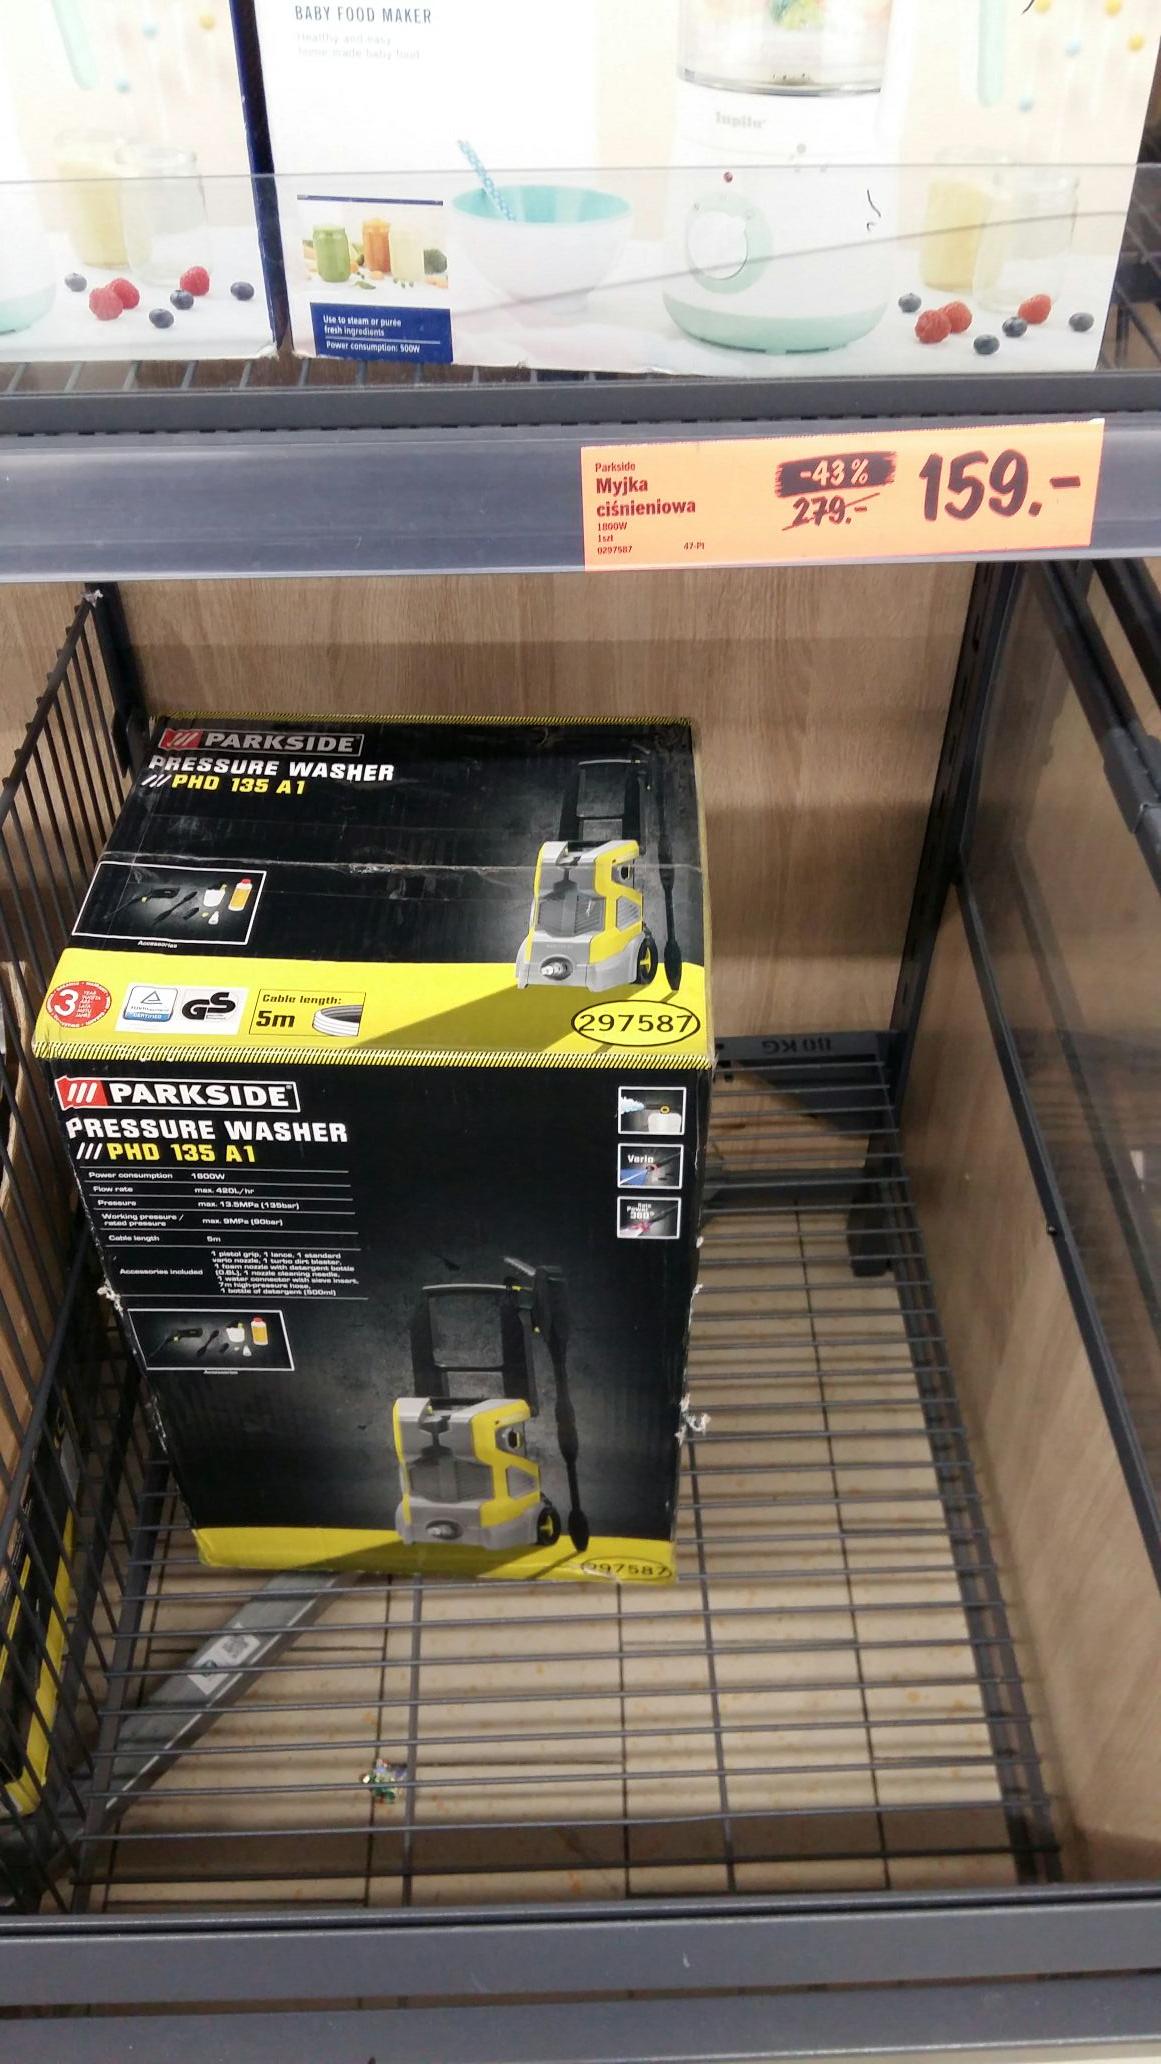 Myjka ciśnieniowa Parkside PHD 135 A1 Lidl